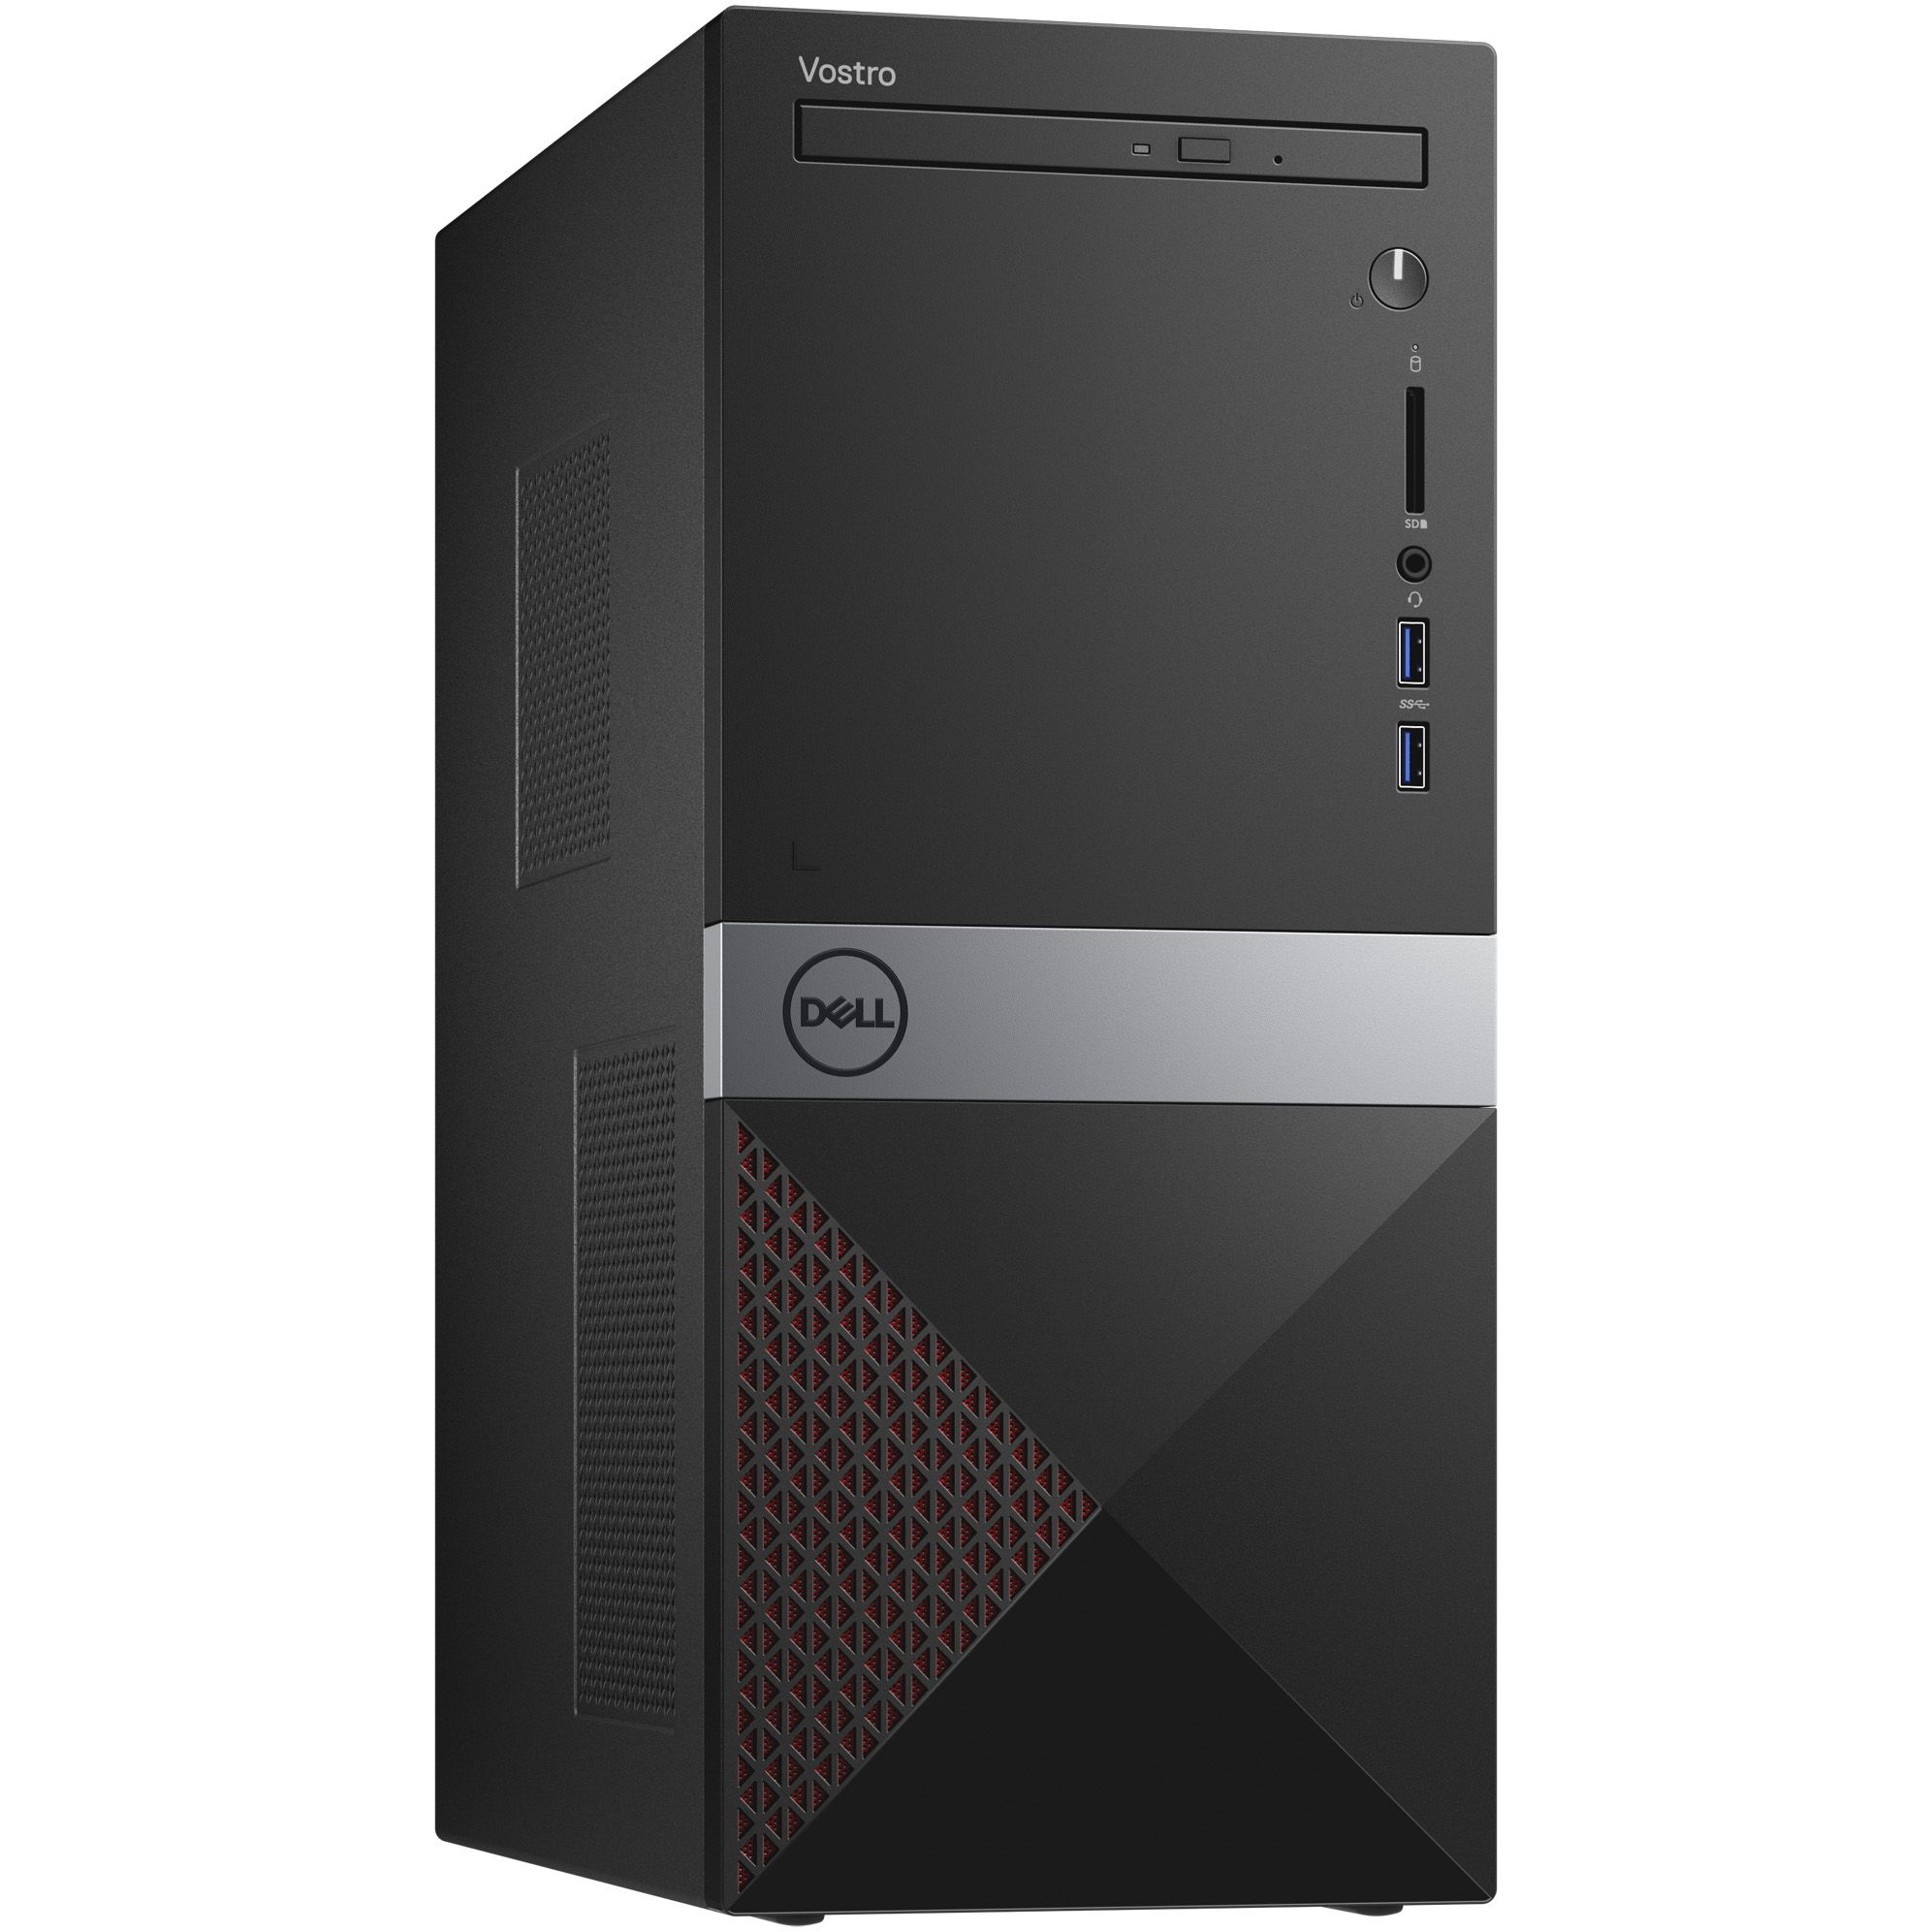 Sistem Brand Dell Vostro 3671 MT Intel Core i5-9400 RAM 8GB HDD 1TB Windows 10 Pro